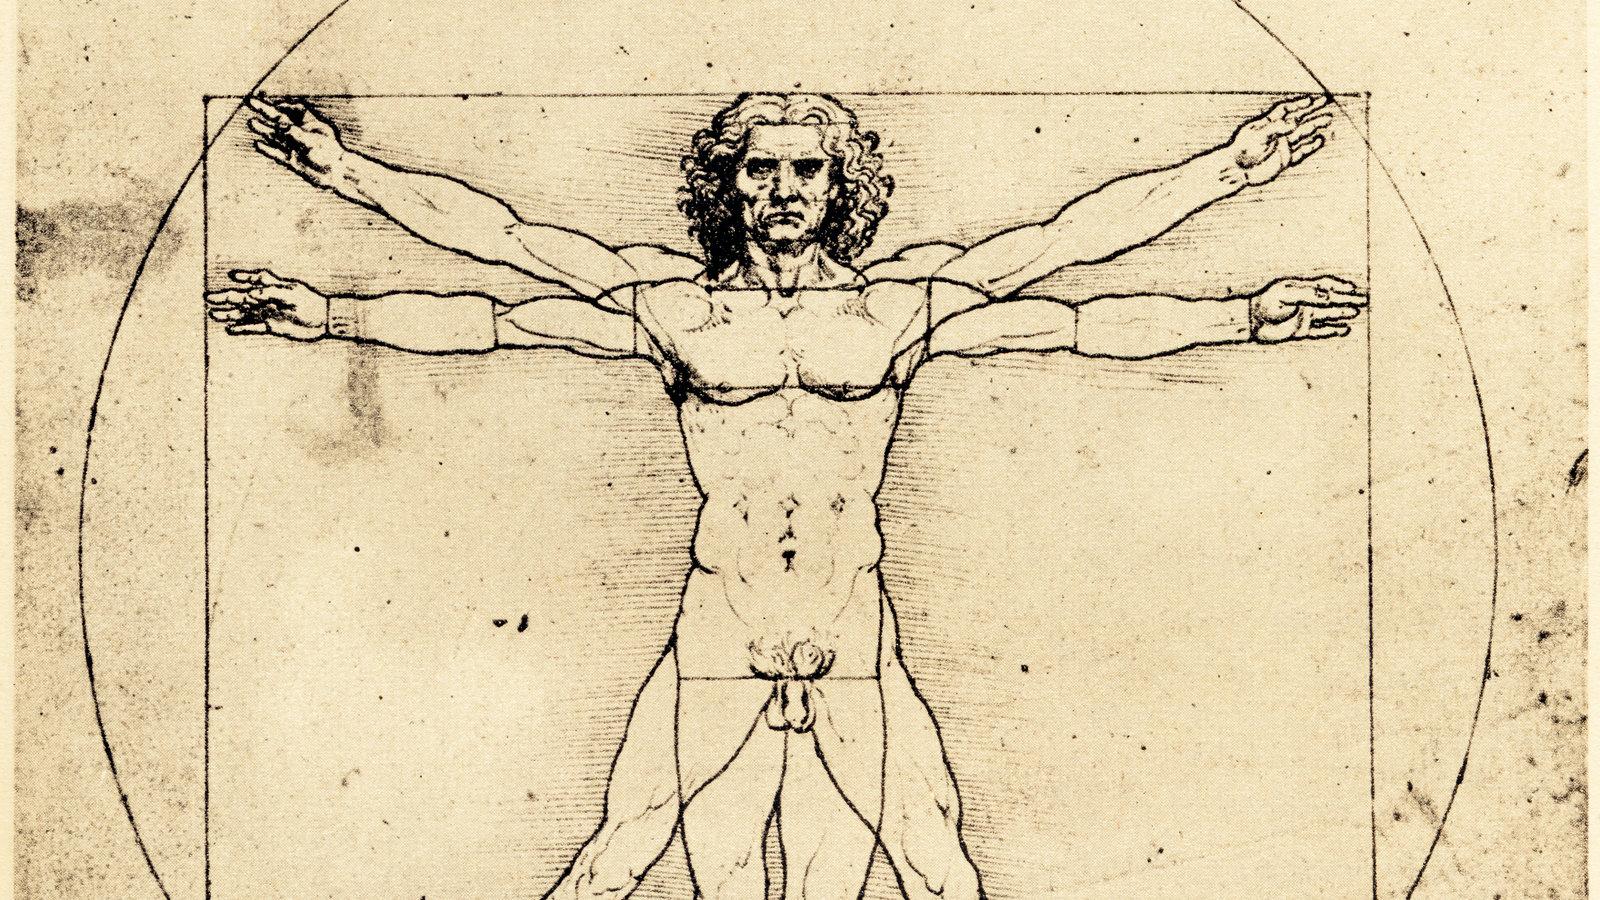 Italy To Lend Leonardo Da Vinci Works To France In A